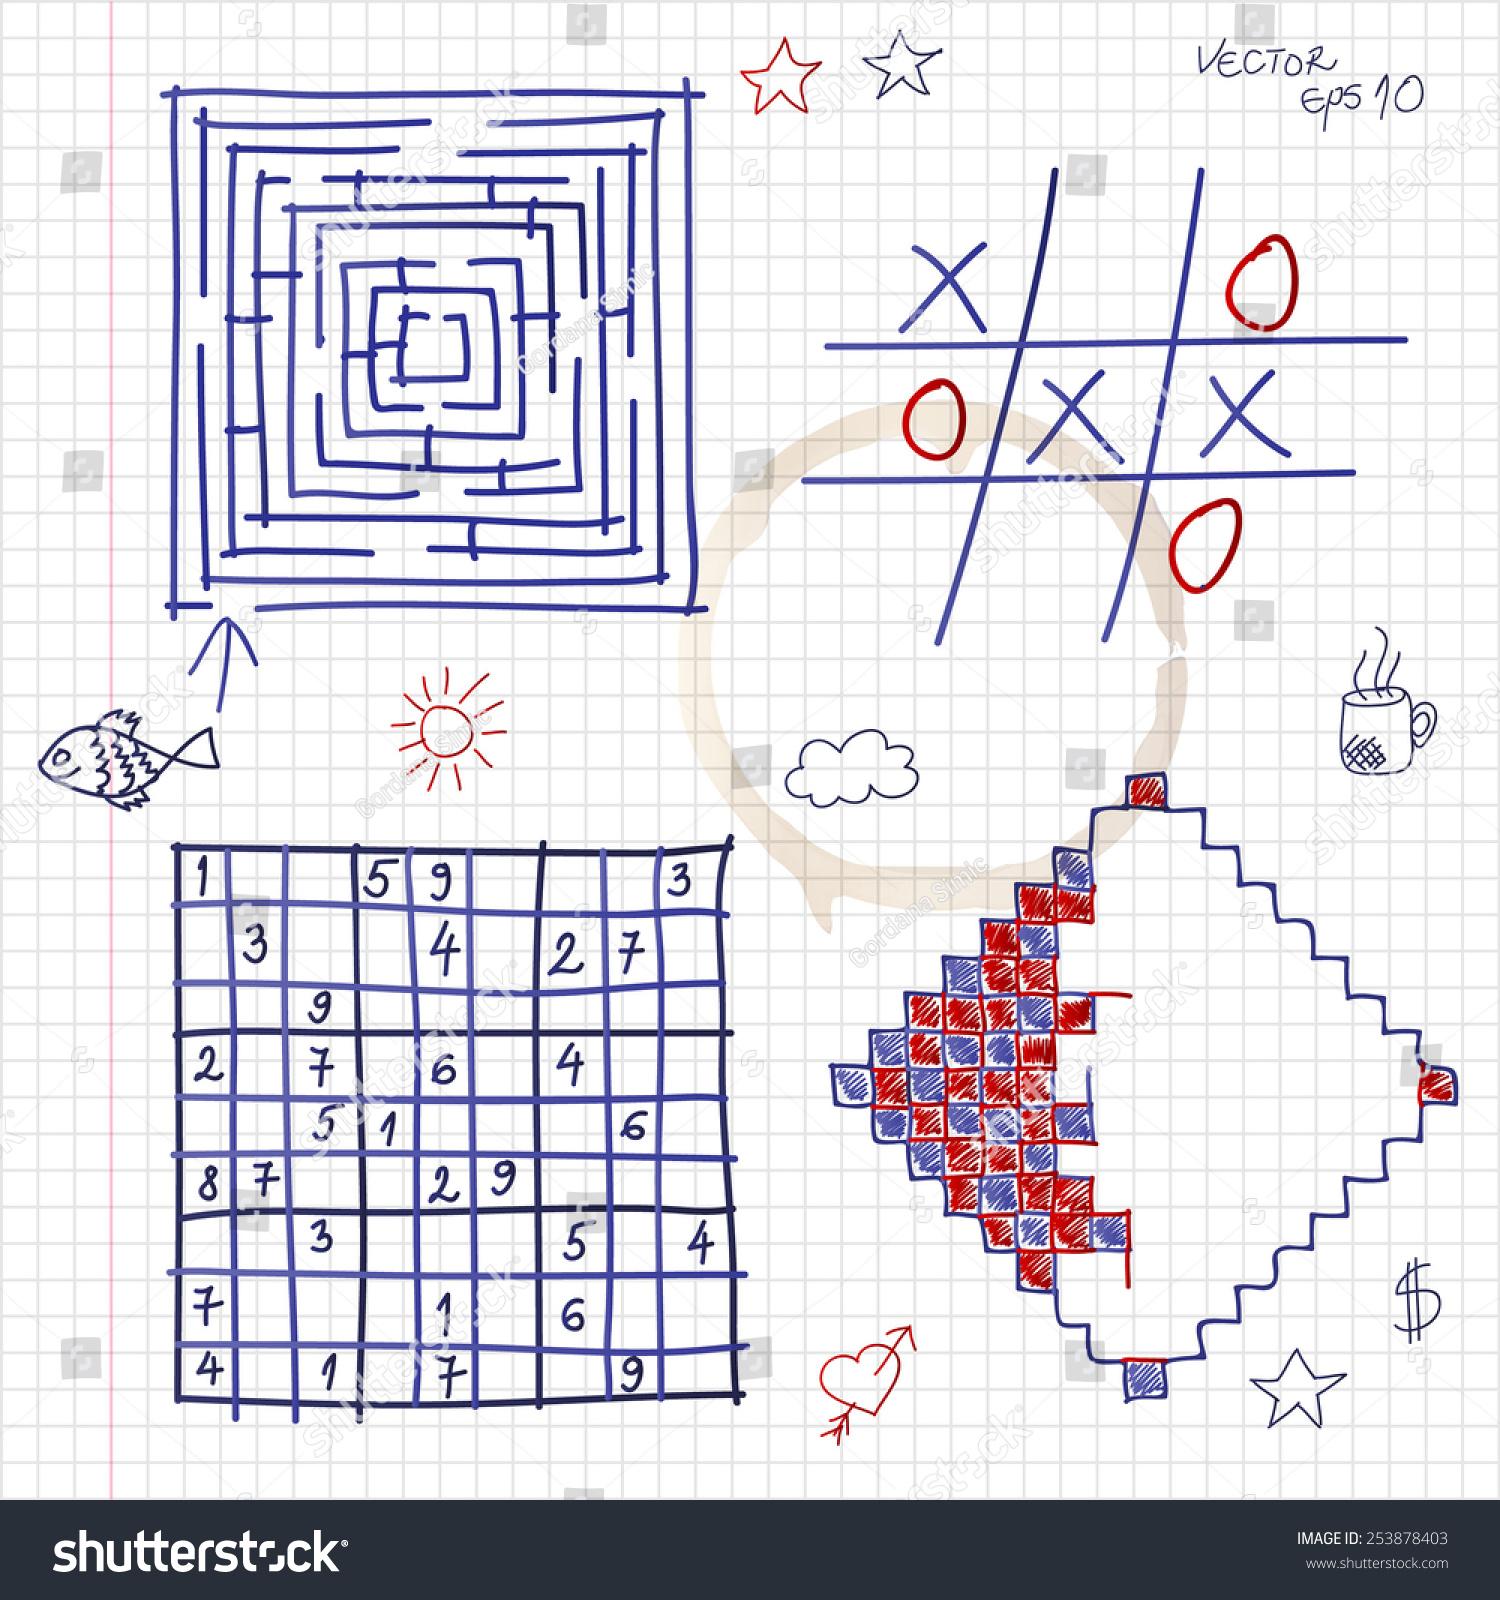 Hand Drawn Games Notepad Vector Eps10 Stock Vector (Royalty